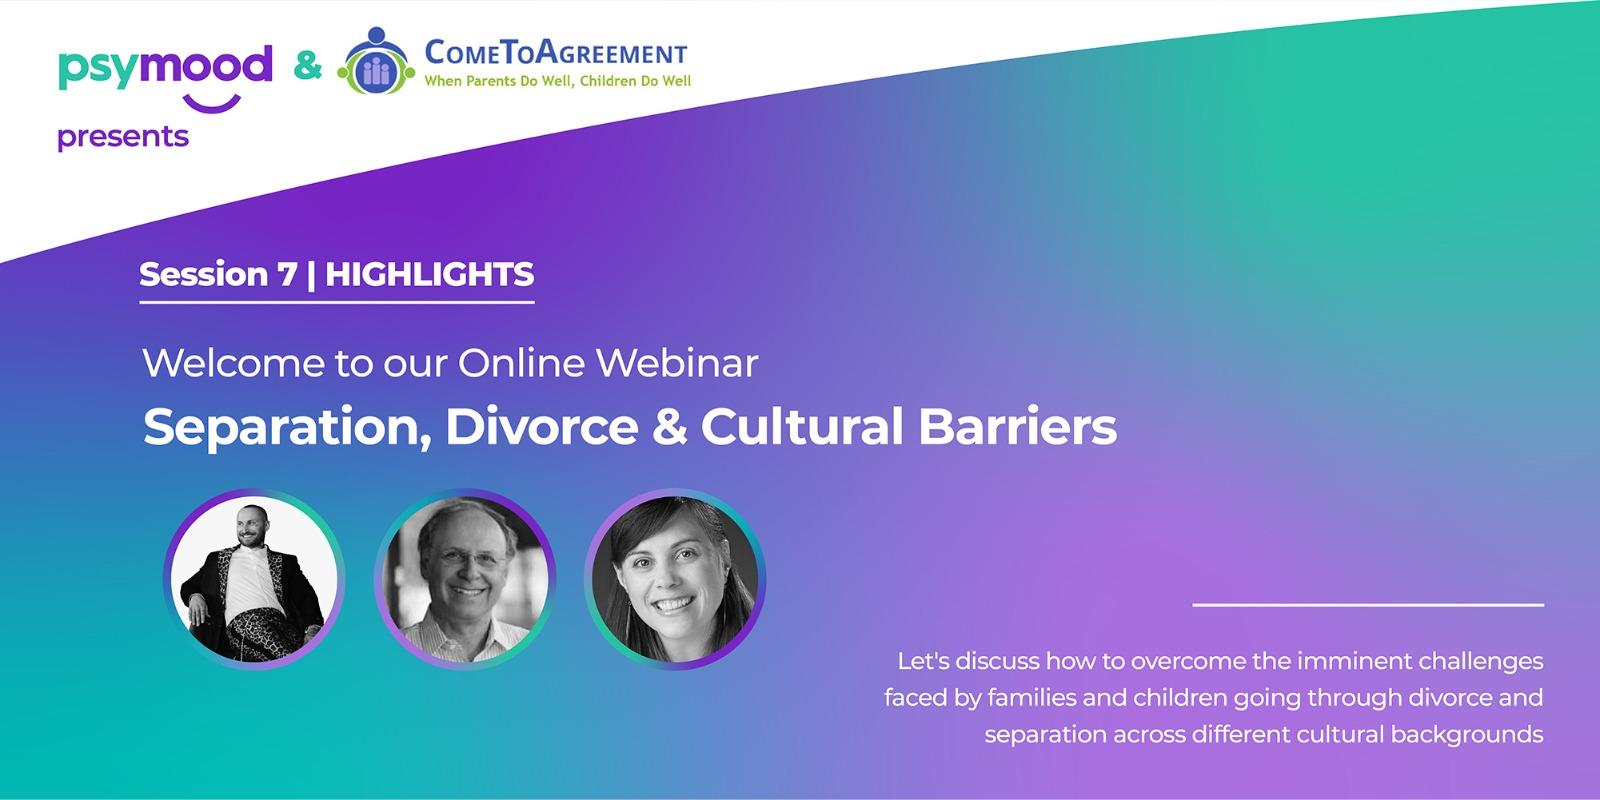 Separation, Divorce & Cultural Barriers – Session Highlights